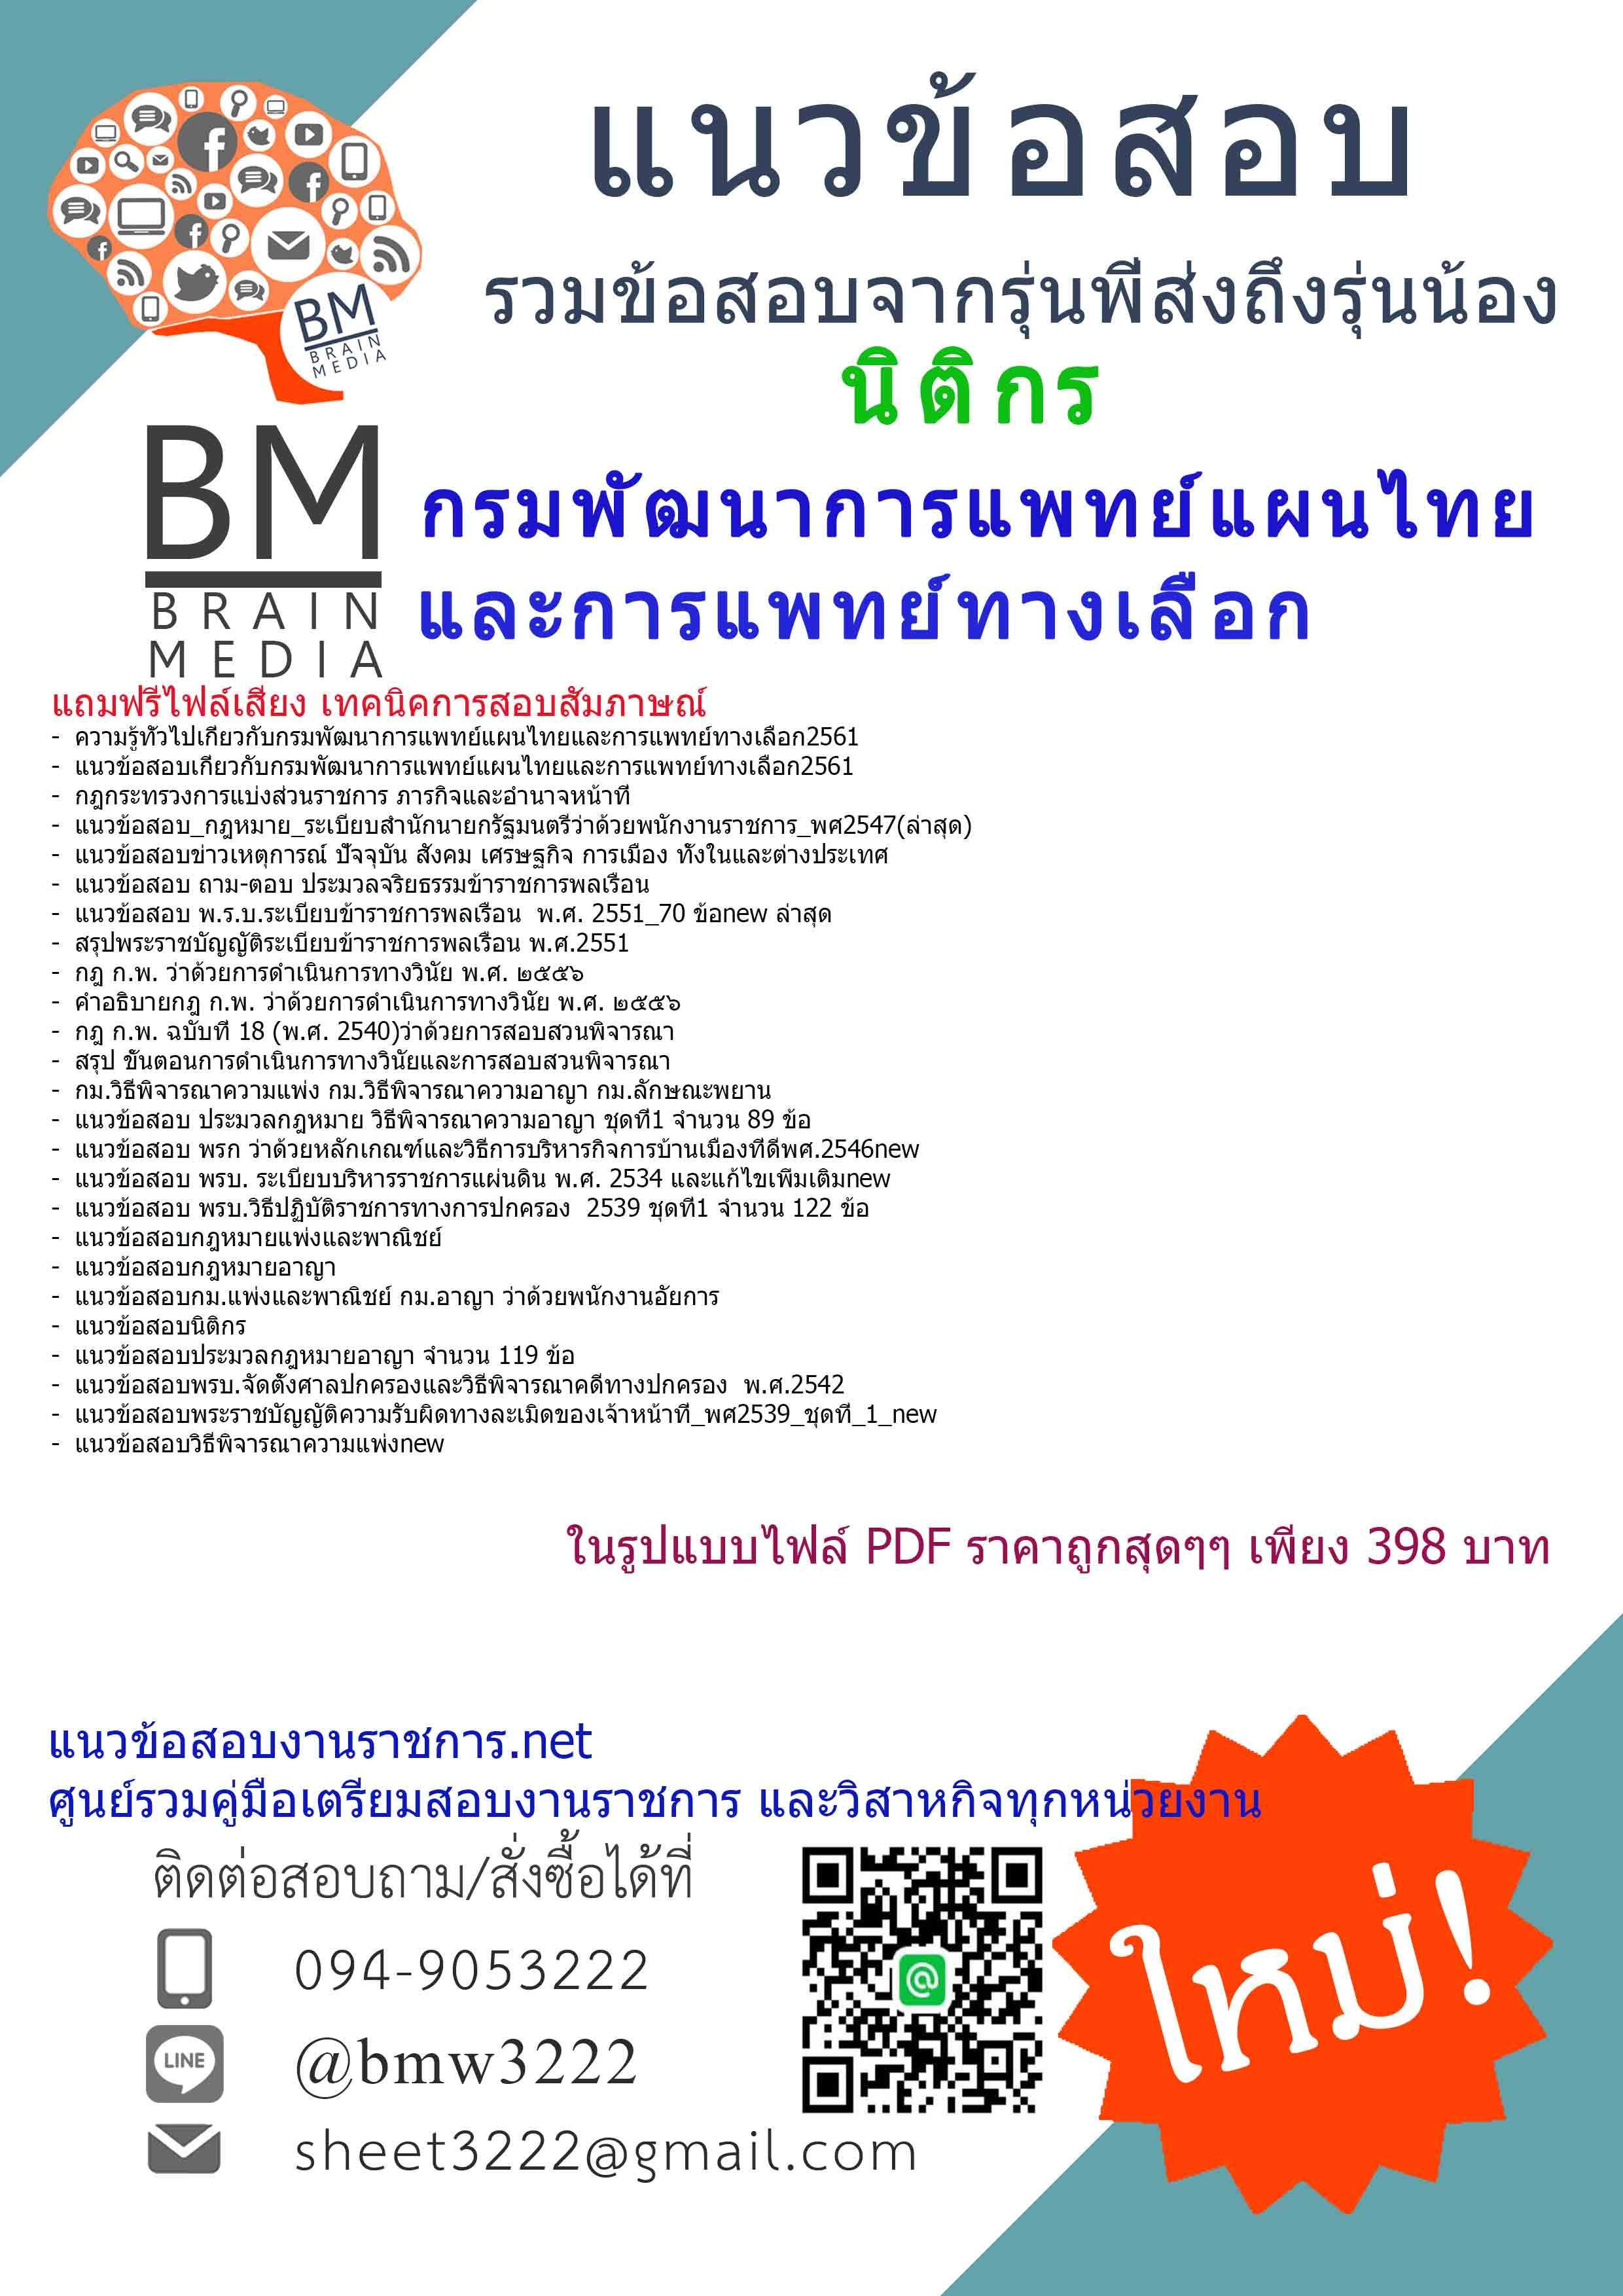 (((newupdateสุด)))แนวข้อสอบนิติกรกรมพัฒนาการแพทย์แผนไทยและการแพทย์ทางเลือก2561